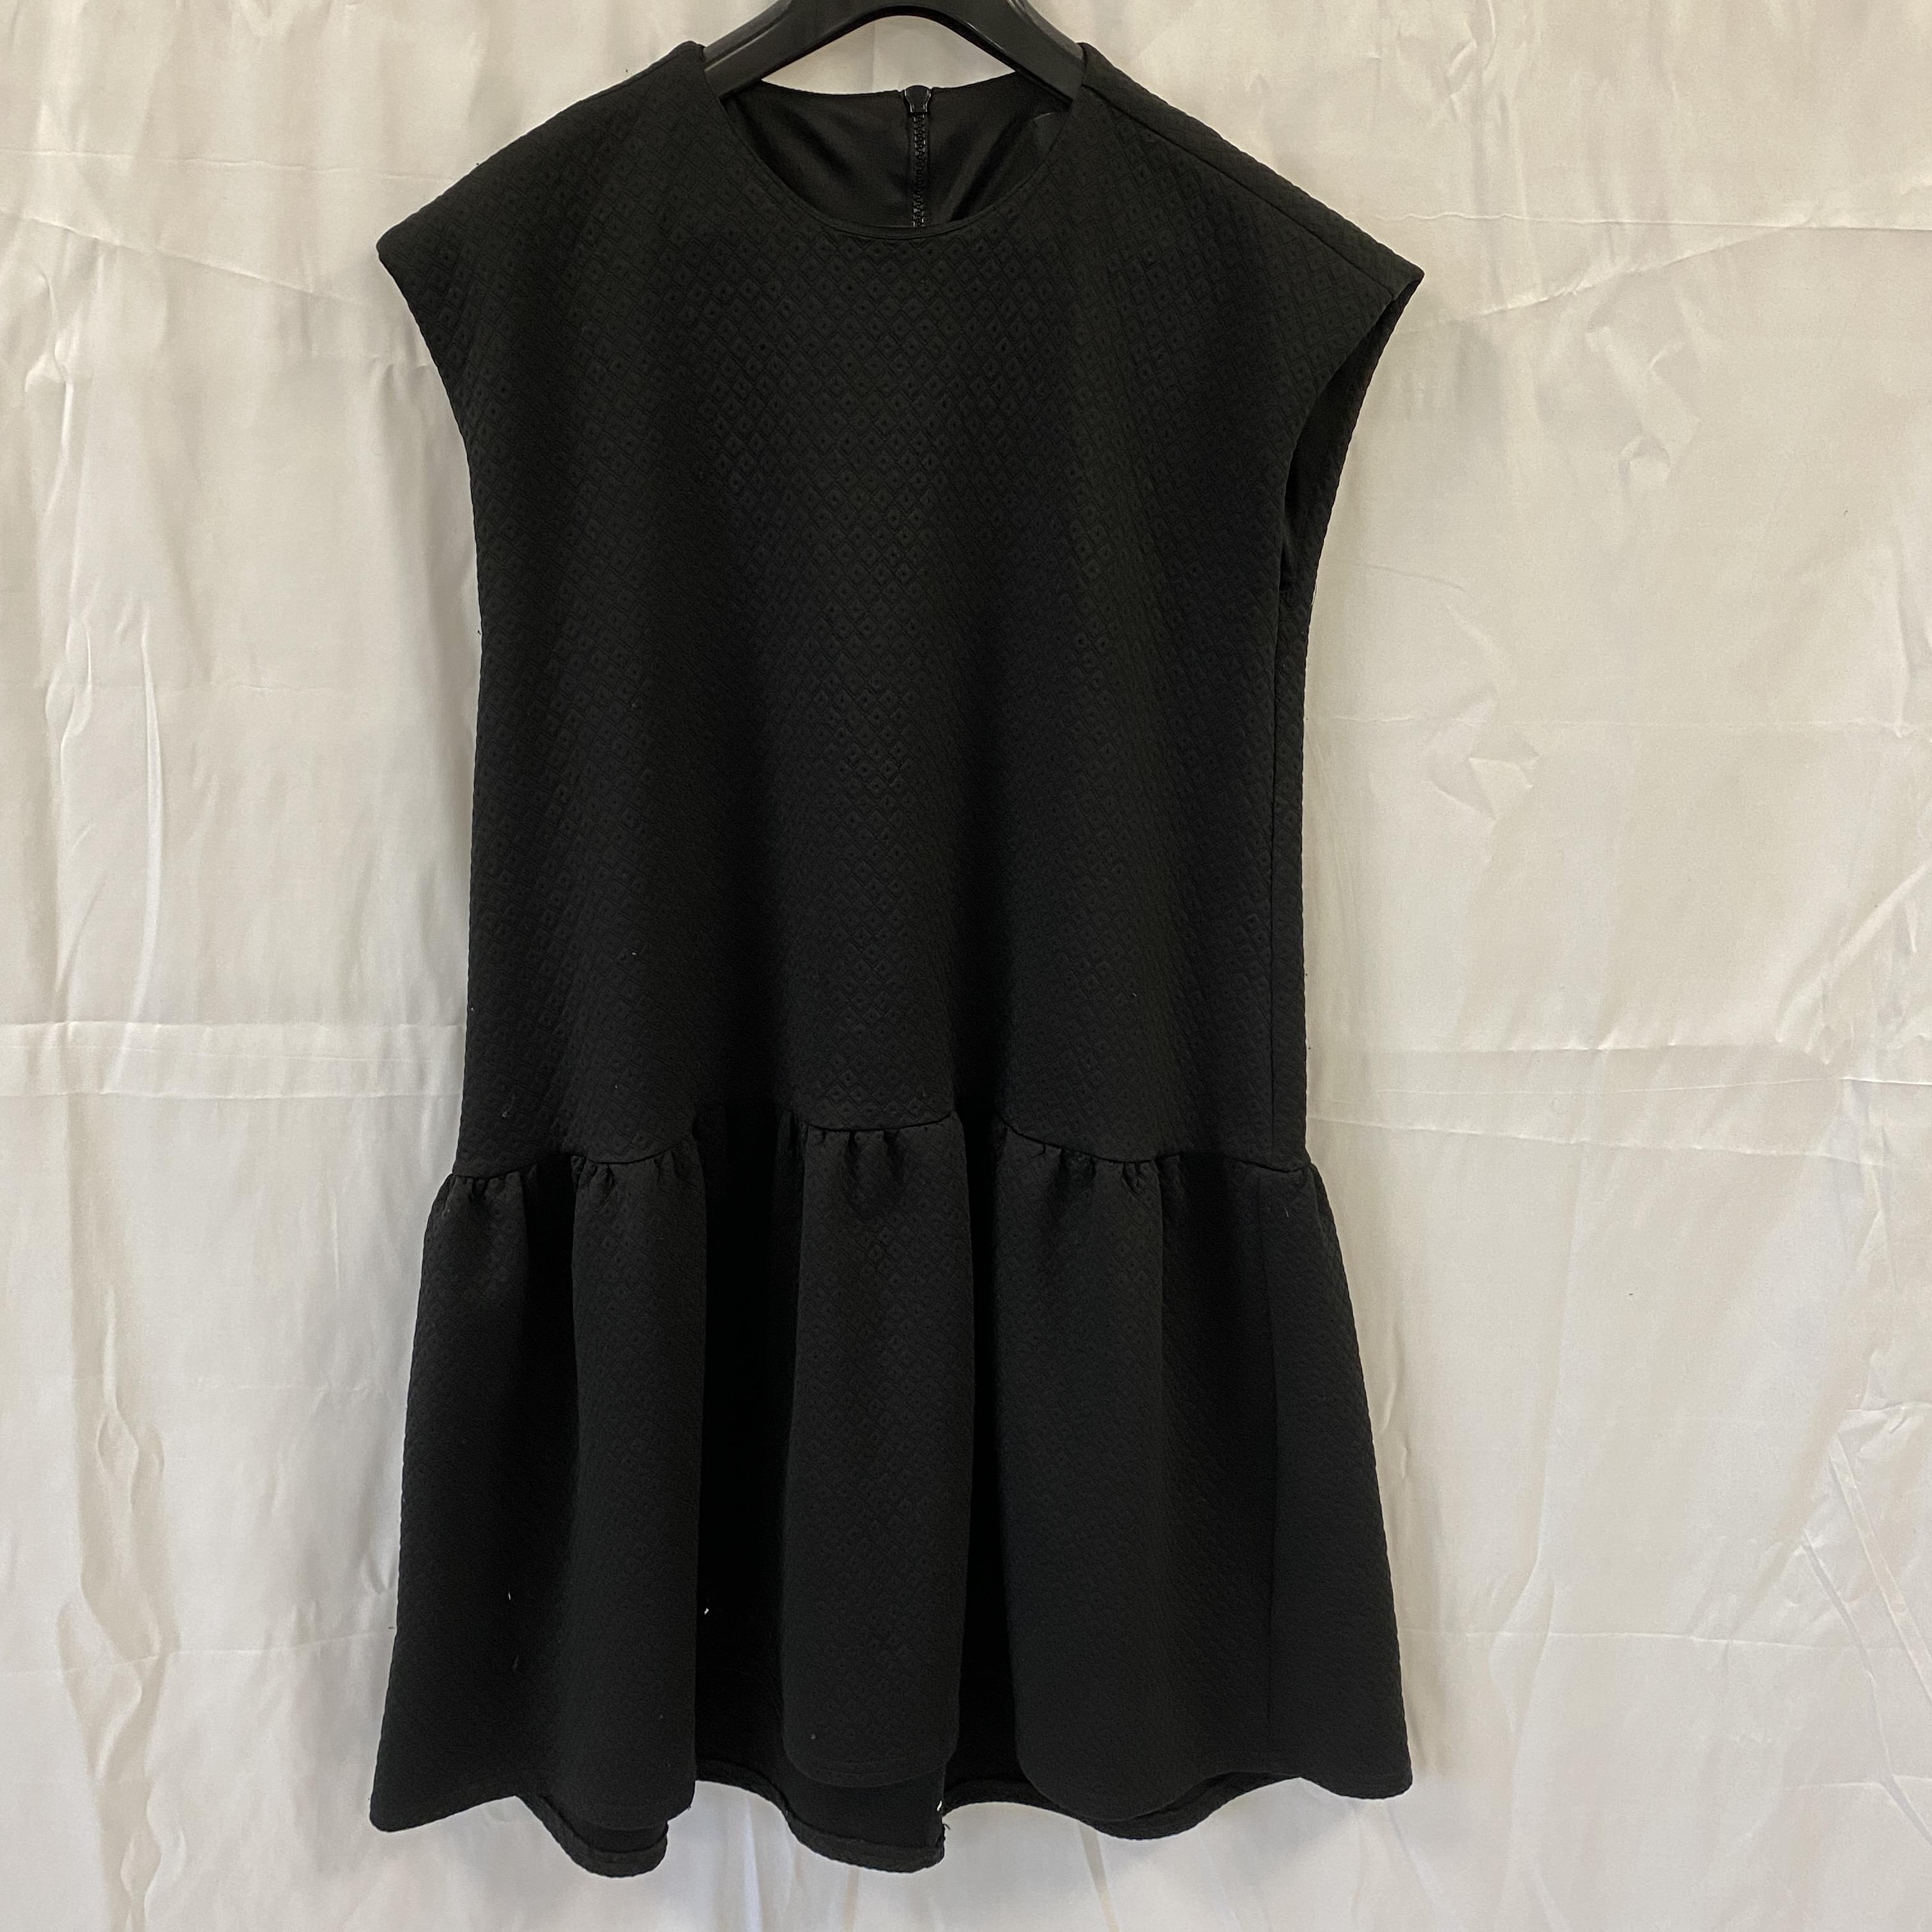 Asos Sleeveless Black Dress - Size 10